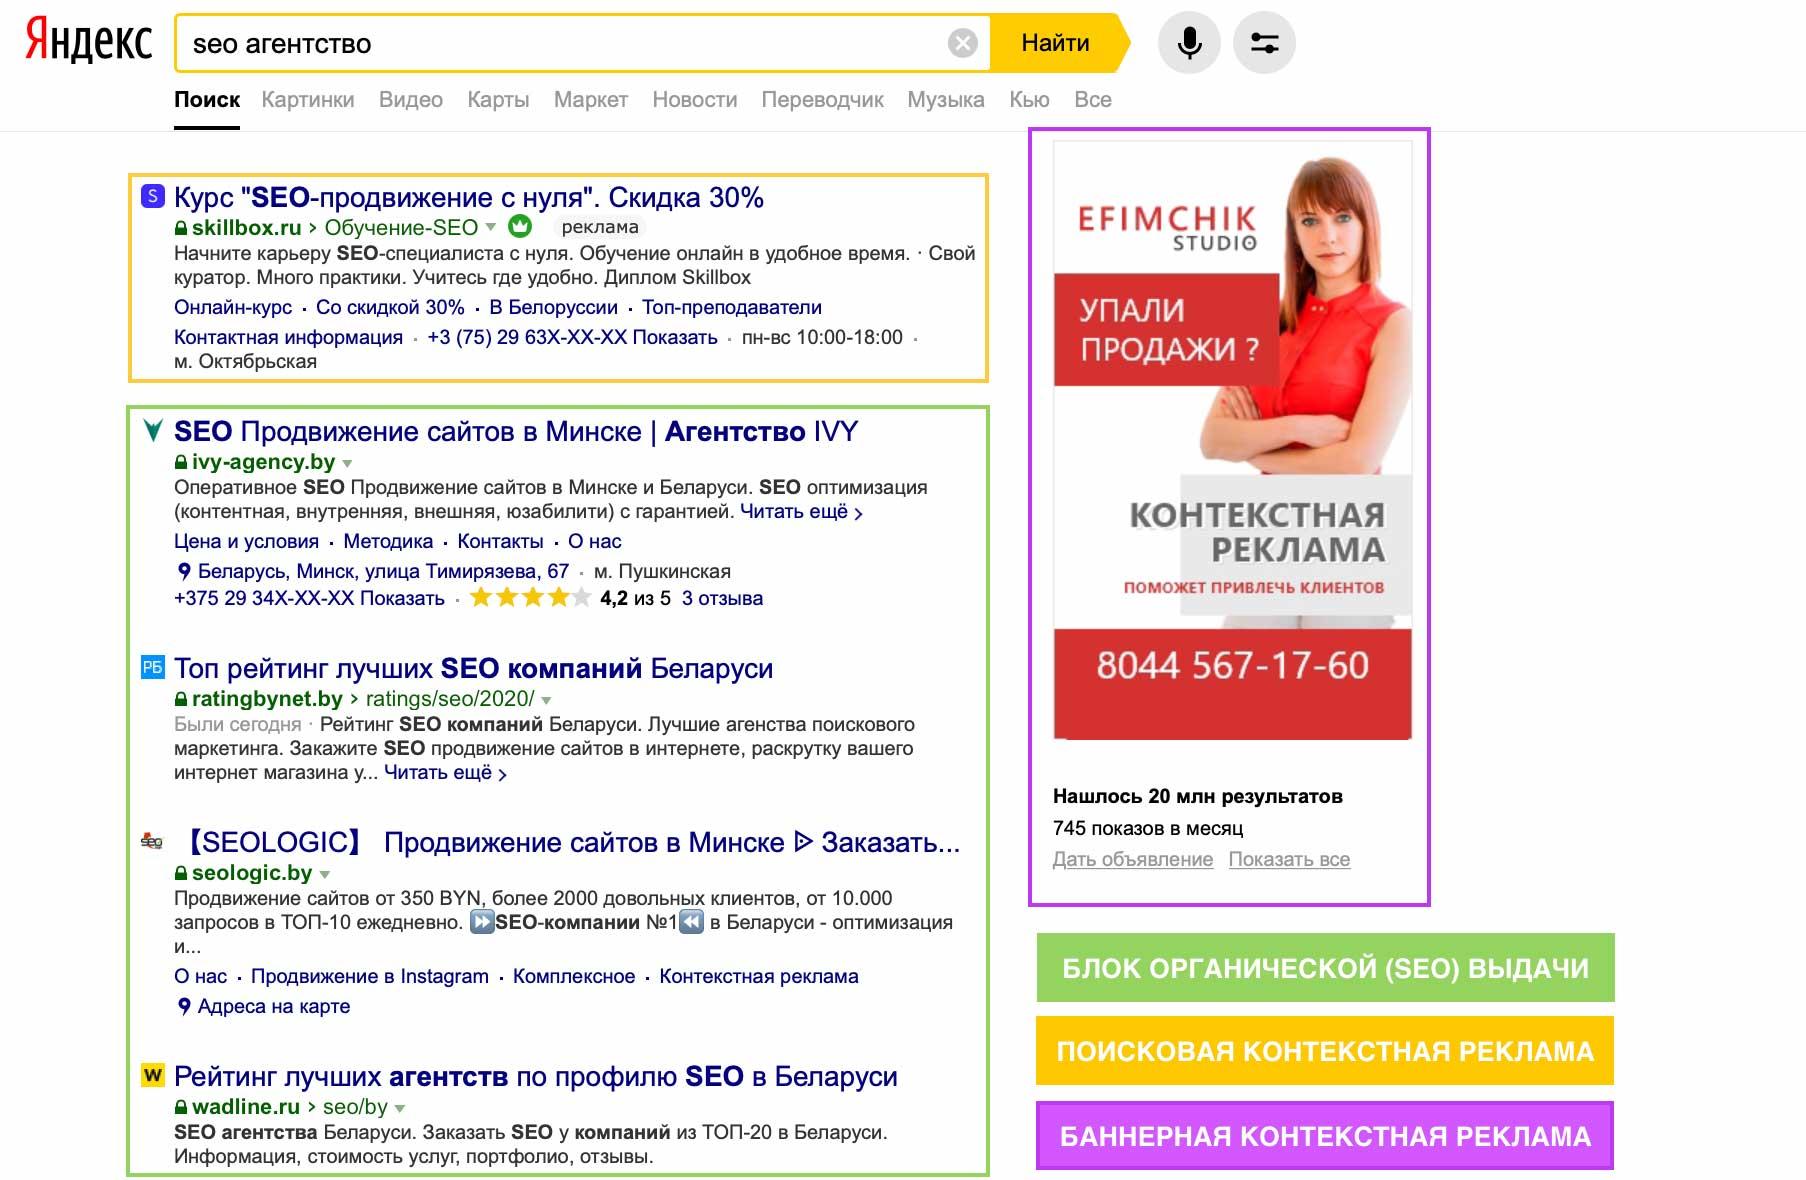 Seo сайт yandex маркетинговое агенство Олонец